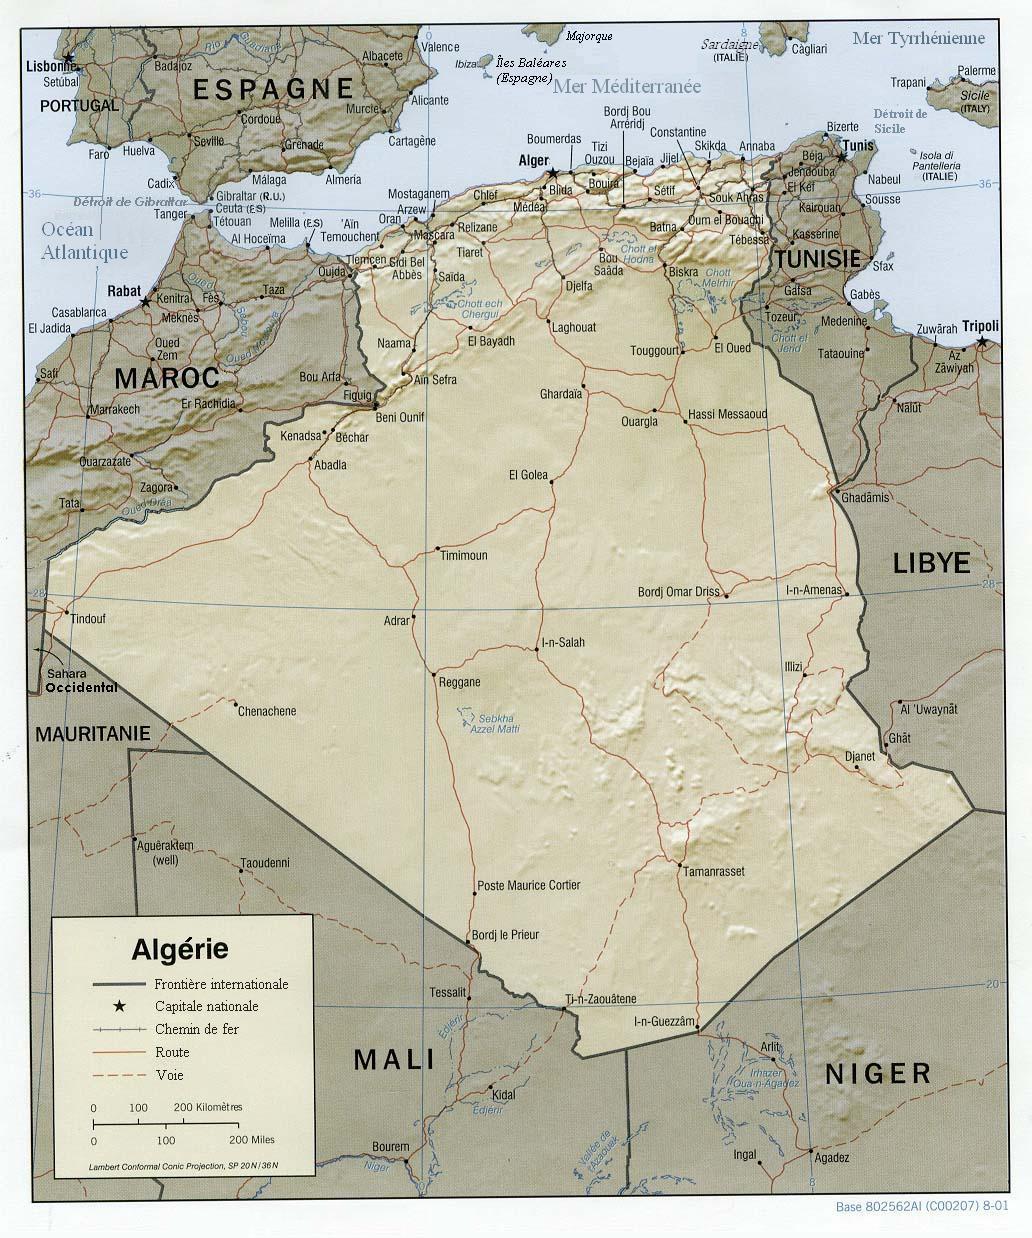 Carte Algerie Reggane.Geographie De L Algerie Wikipedia